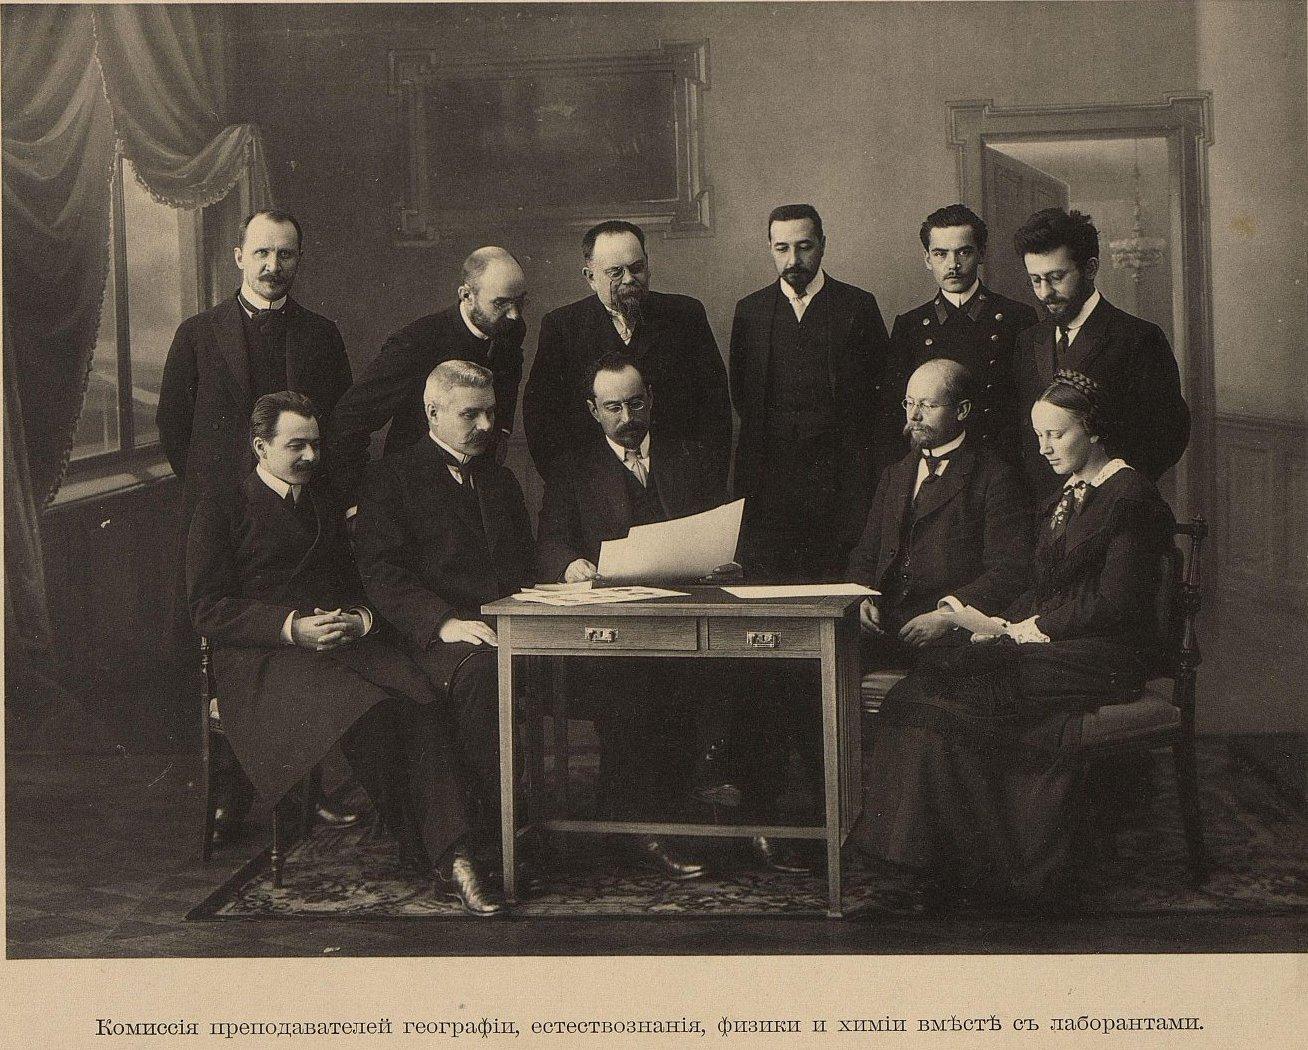 30. Комиссия преподавателей географии, естествознания, физики и химии вместе с лаборантами